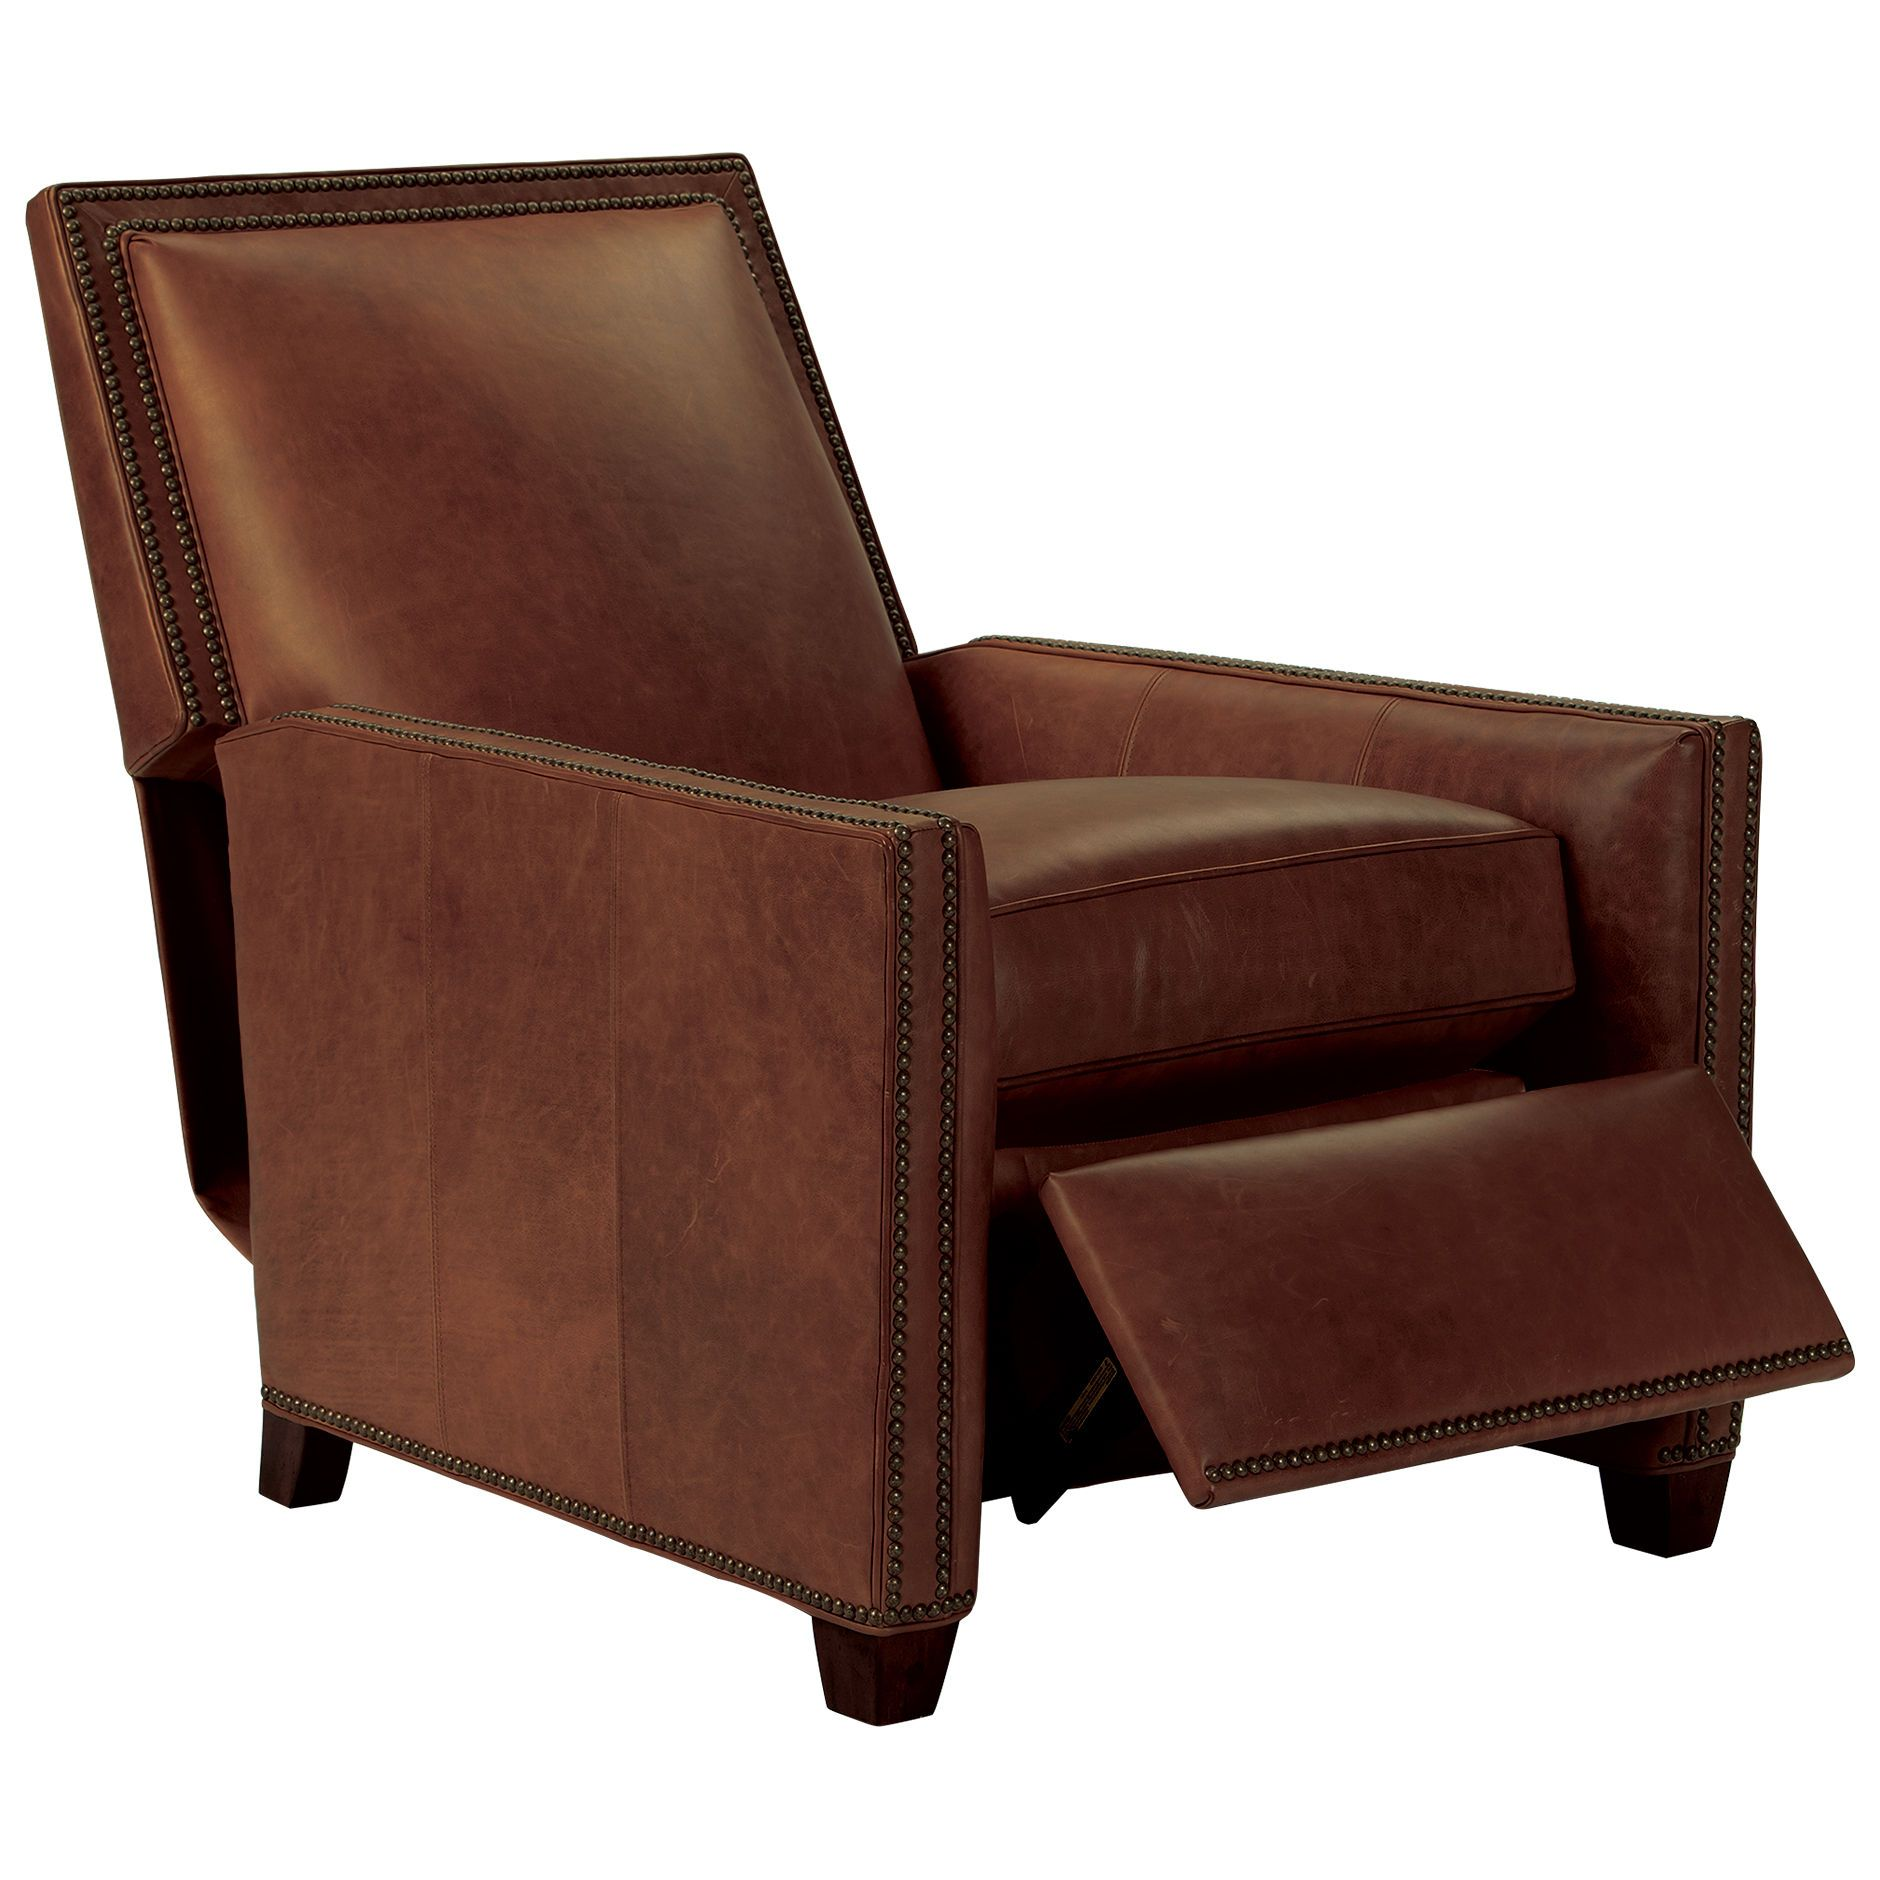 Astonishing Randall Leather Recliner Old English Saddle Ethan Allen Short Links Chair Design For Home Short Linksinfo